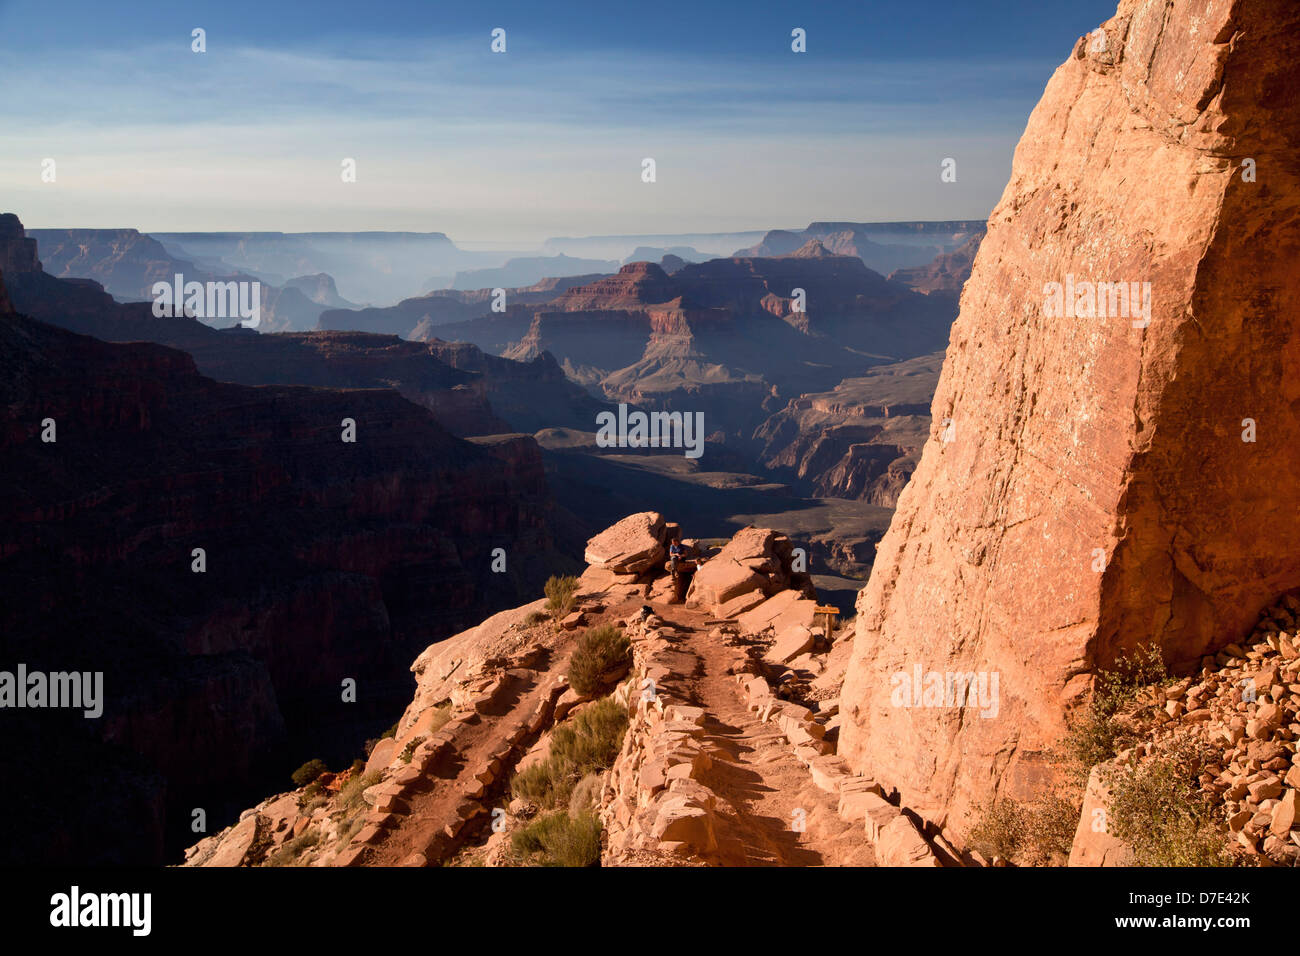 South Kaibab trail through Grand Canyon National Park, Arizona, United States of America, USA - Stock Image